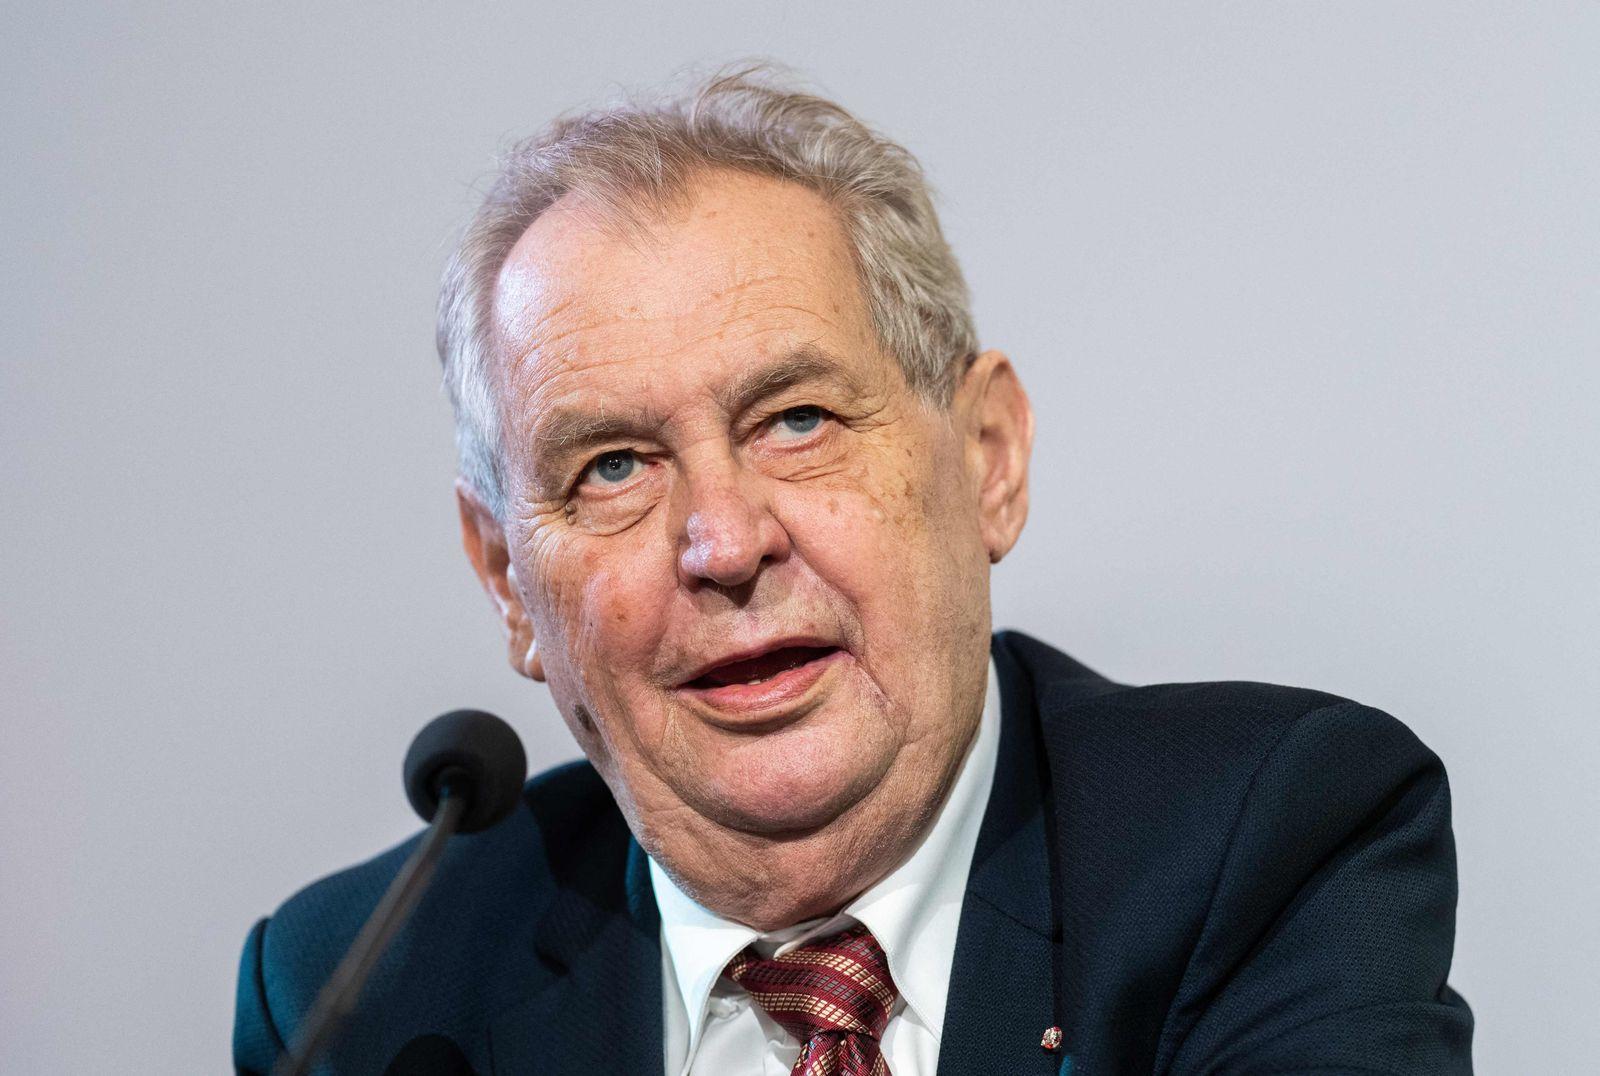 AUSTRIA-CZECH-POLITICS-DIPLOMACY